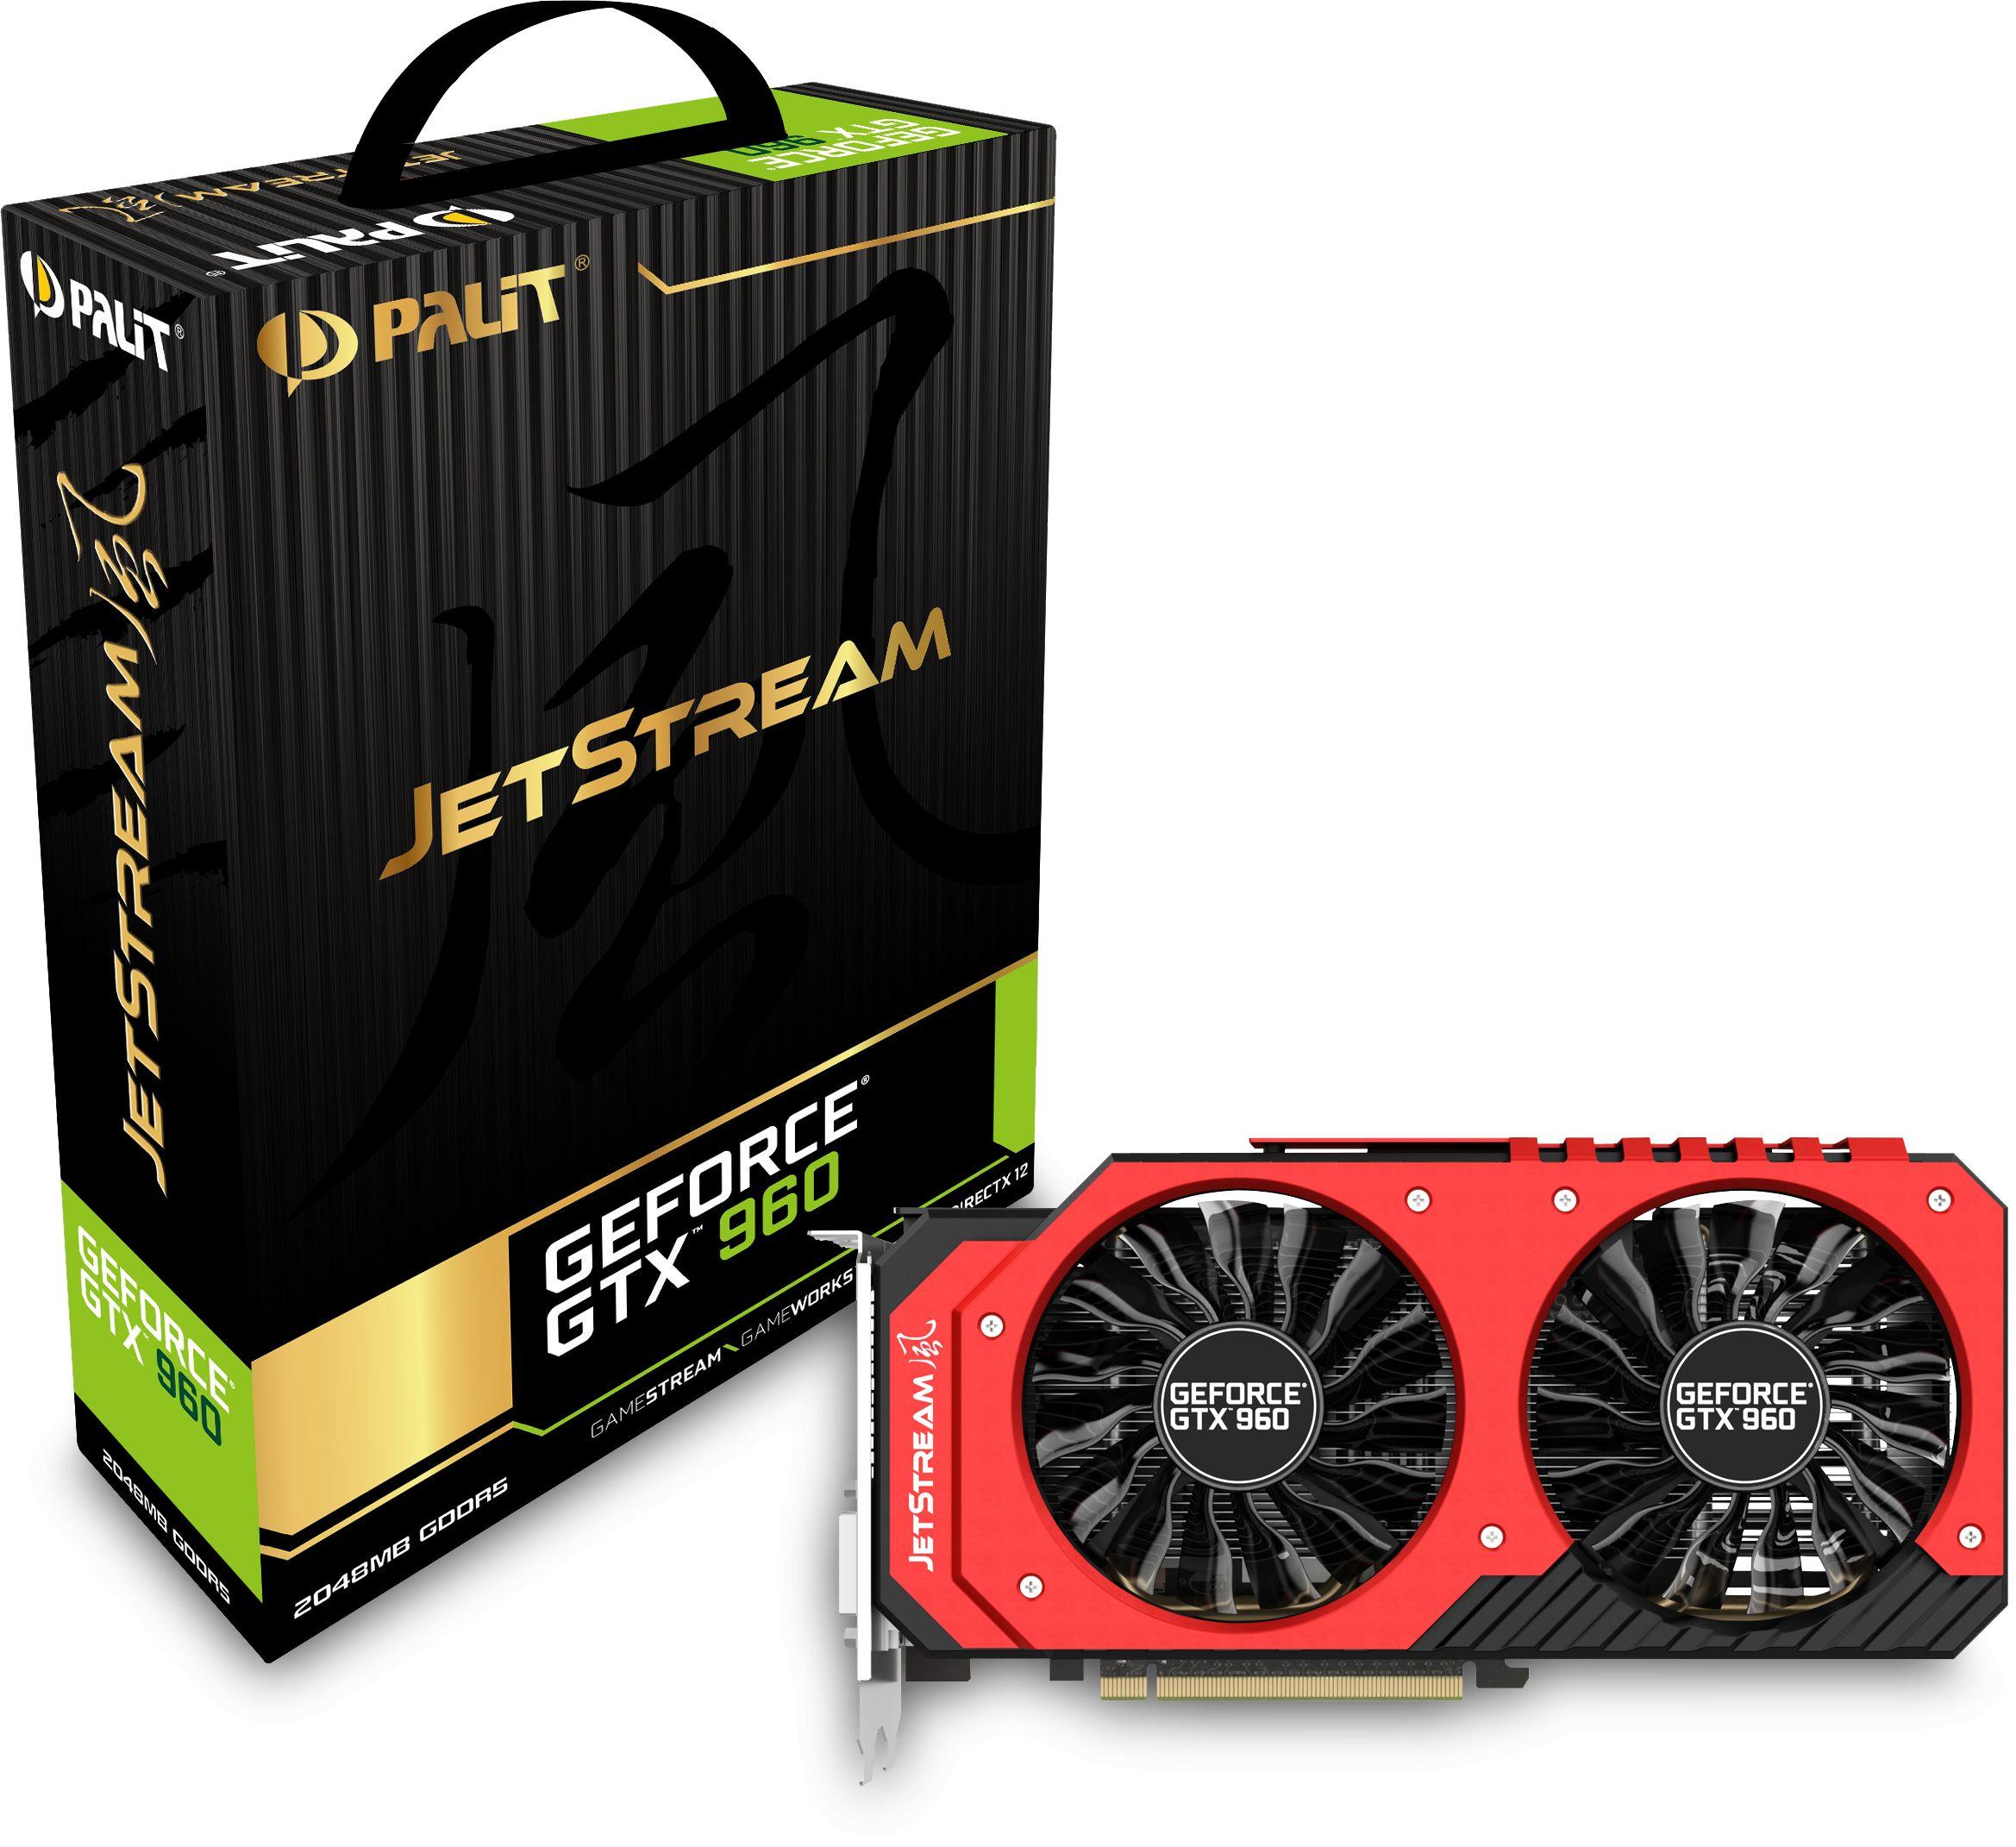 Palit Geforce GTX 960 Jetstream Graphics Cards